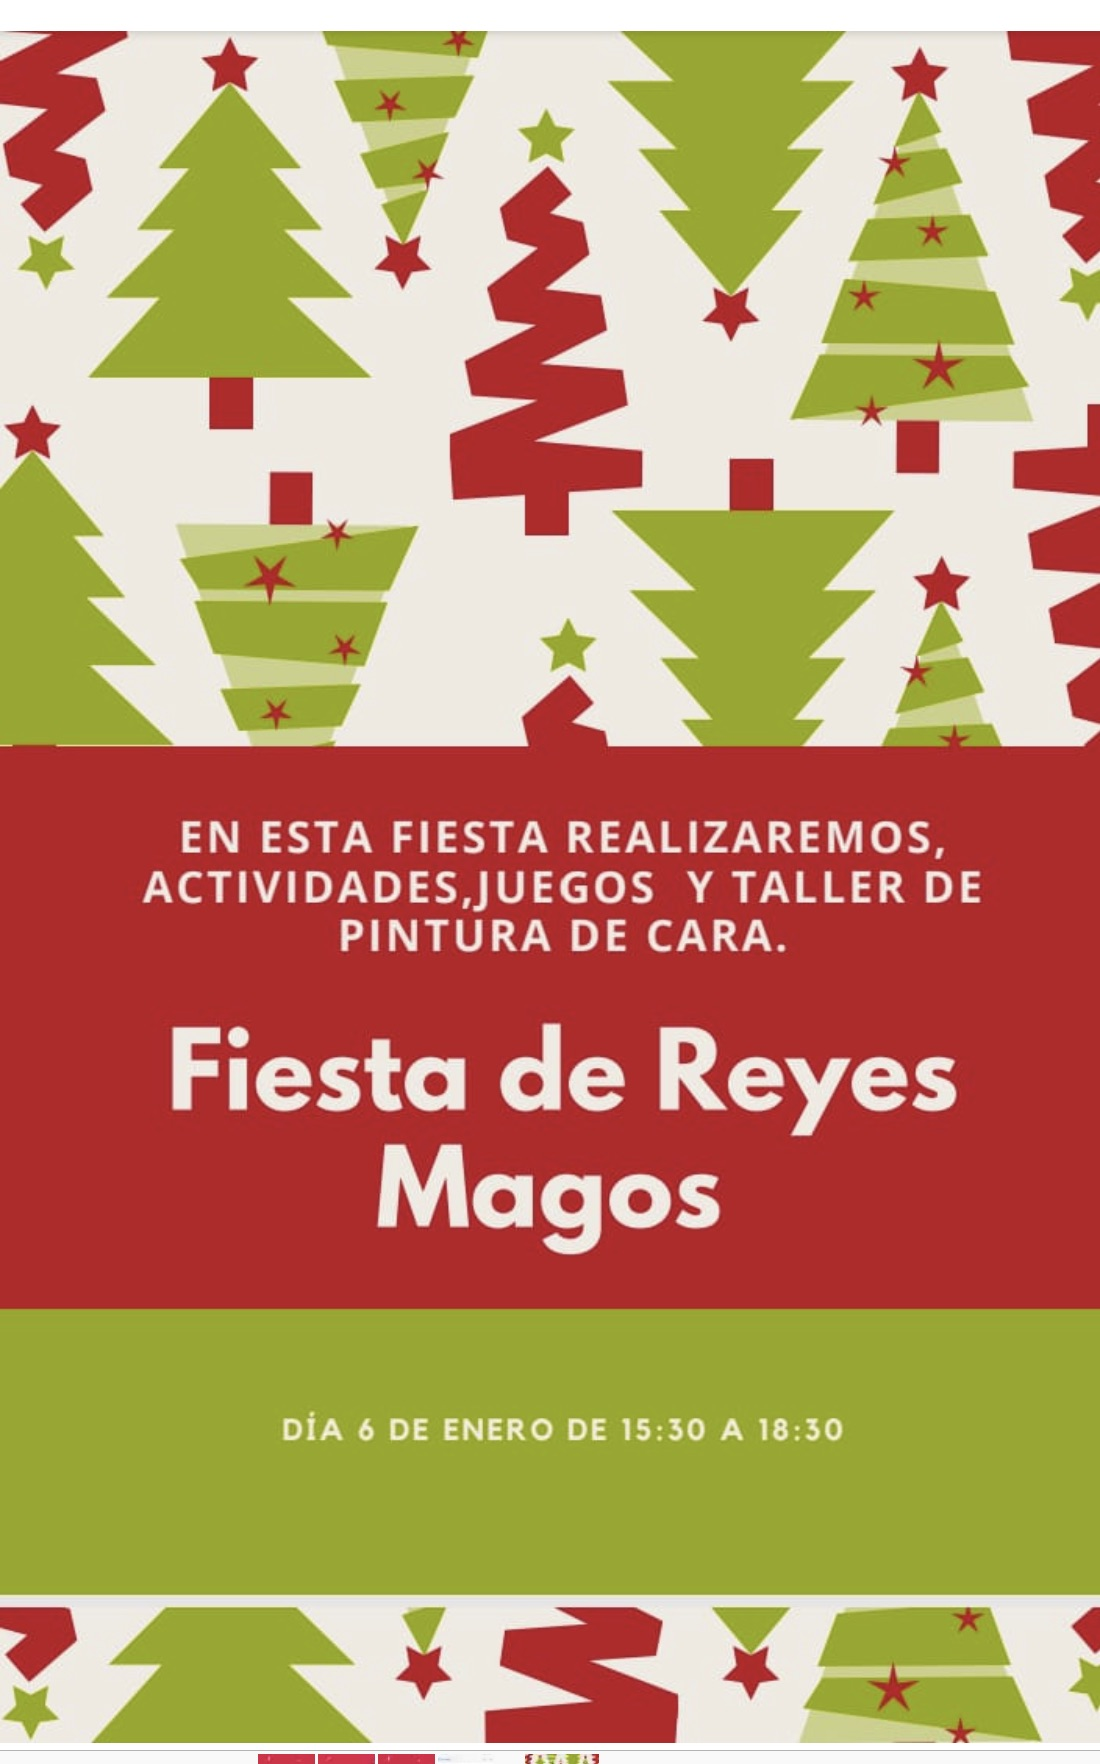 FIESTA DE REYES MAGOS 2020